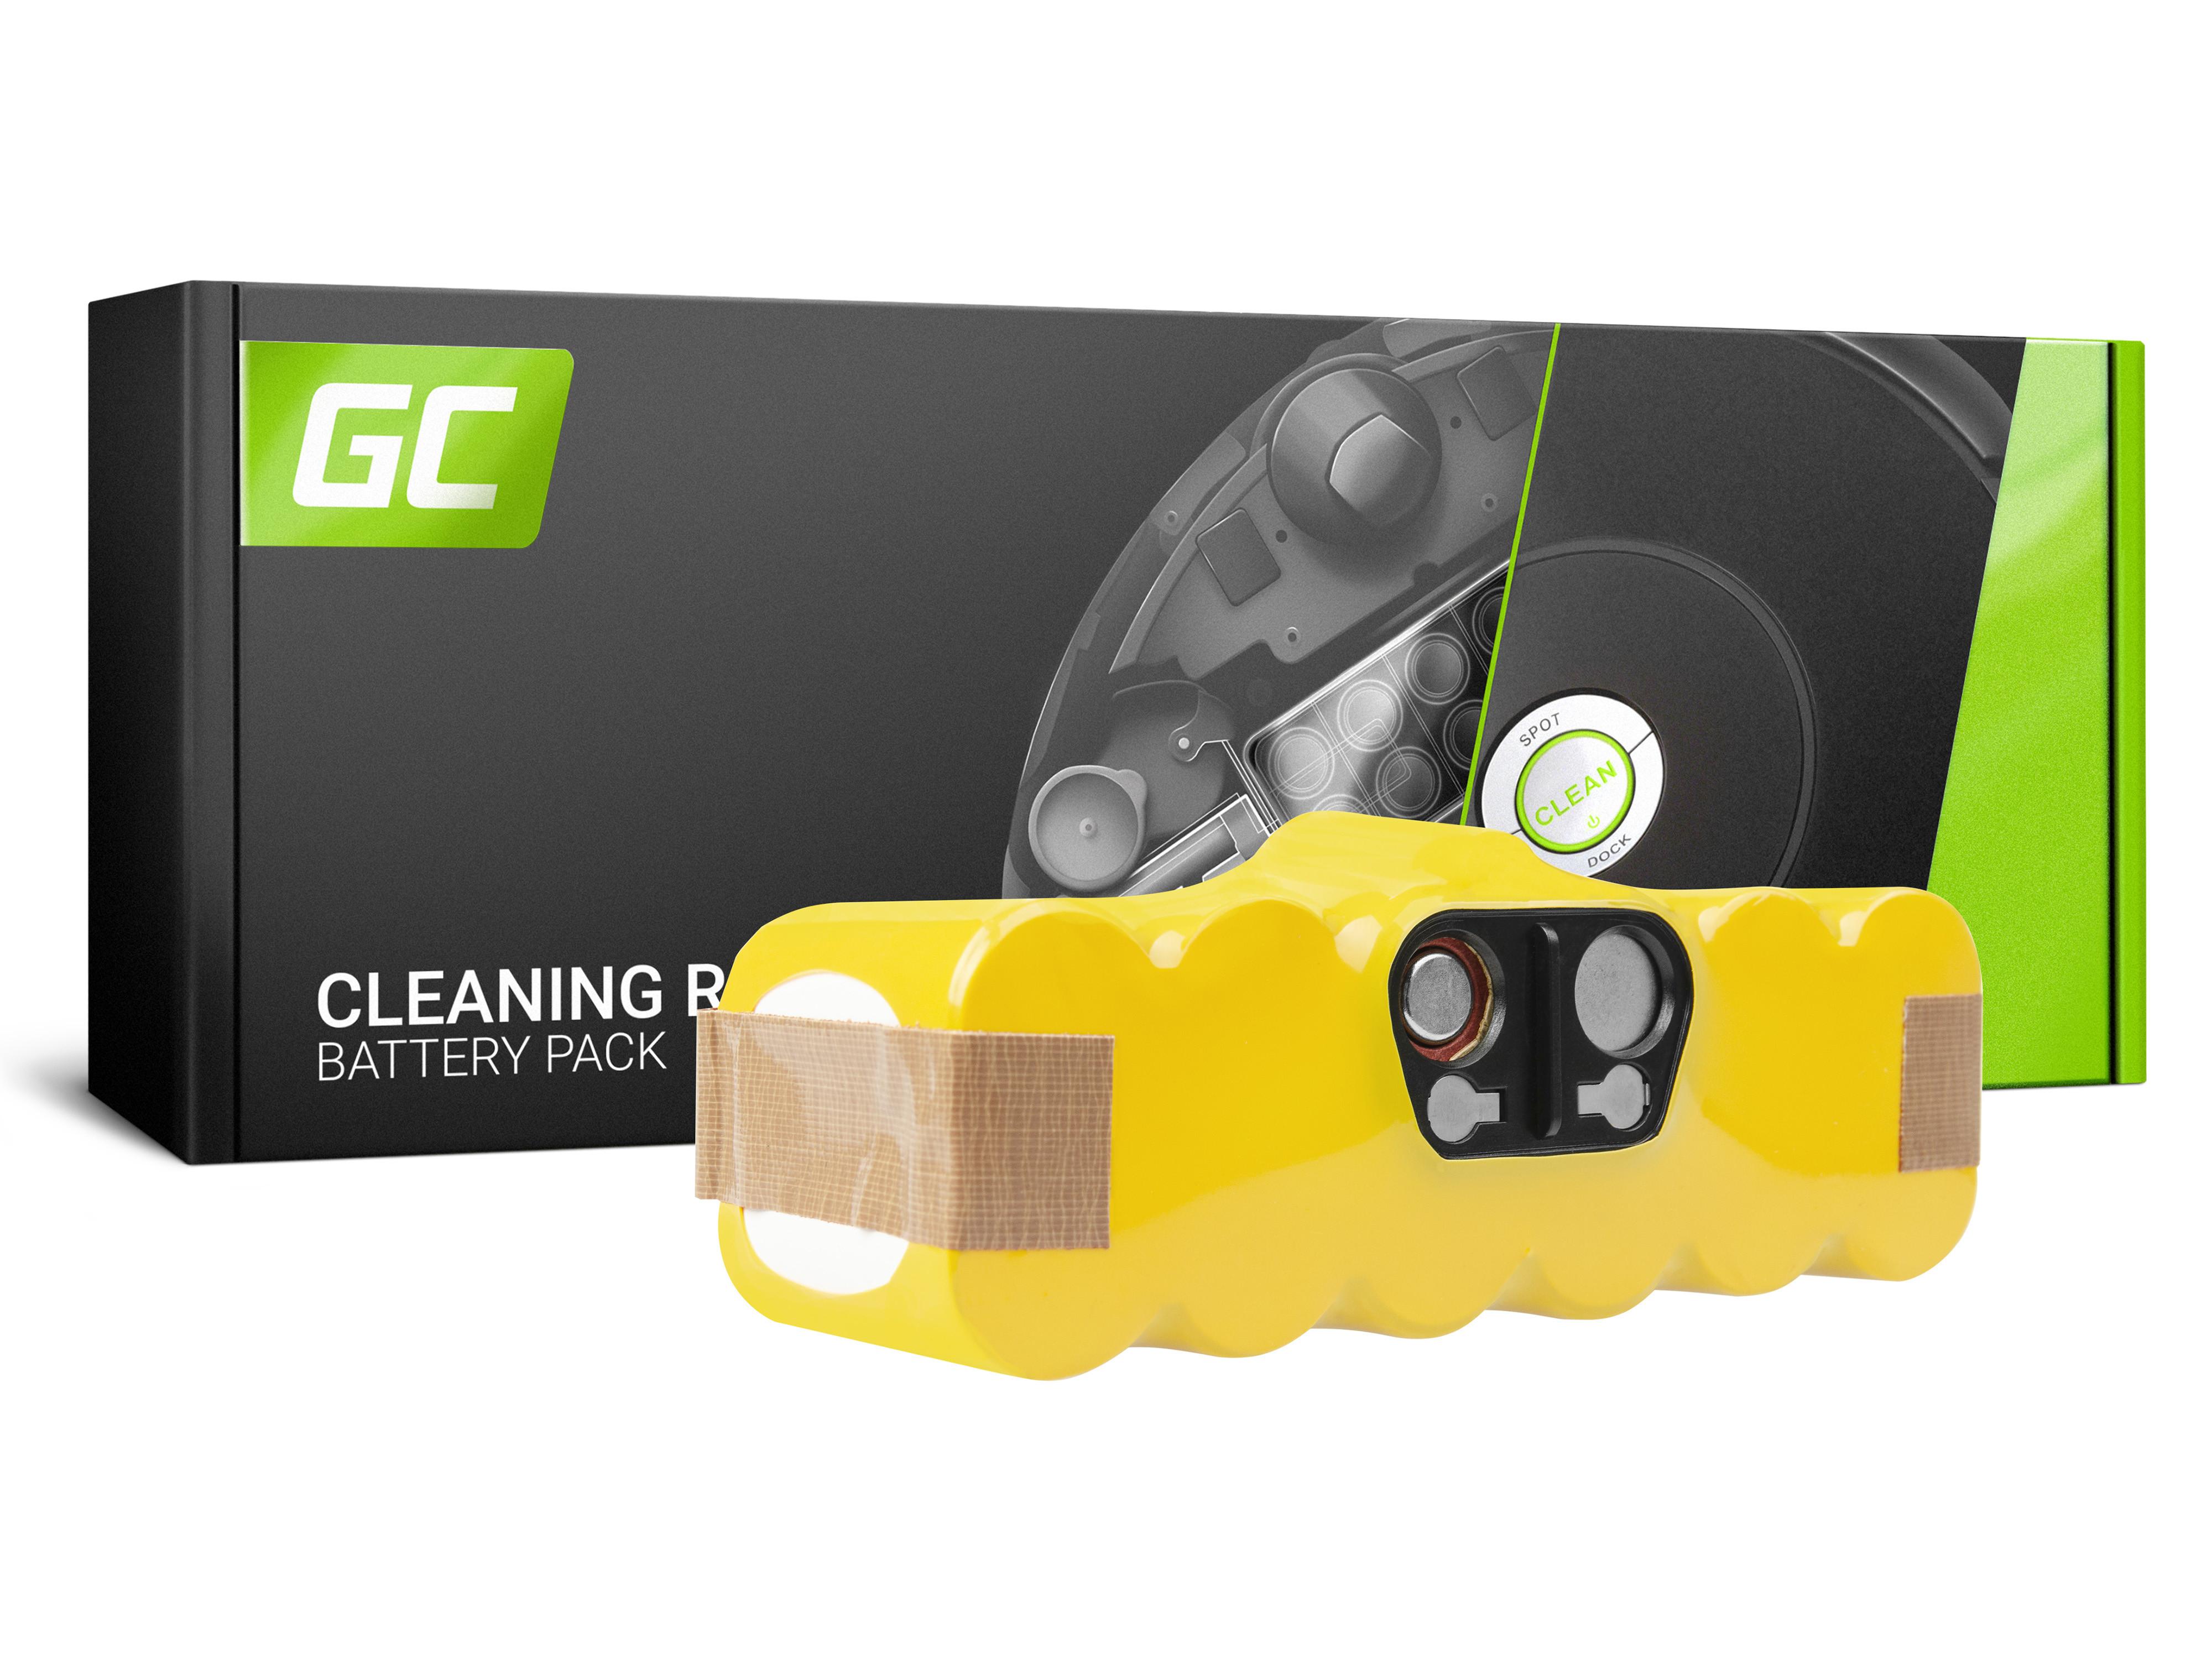 Baterie Green Cell iRobot Roomba 80501 510 530 540 550 560 570 580 610 620 625 760 770 780 14.4V 4500mAh Ni-MH – neoriginální